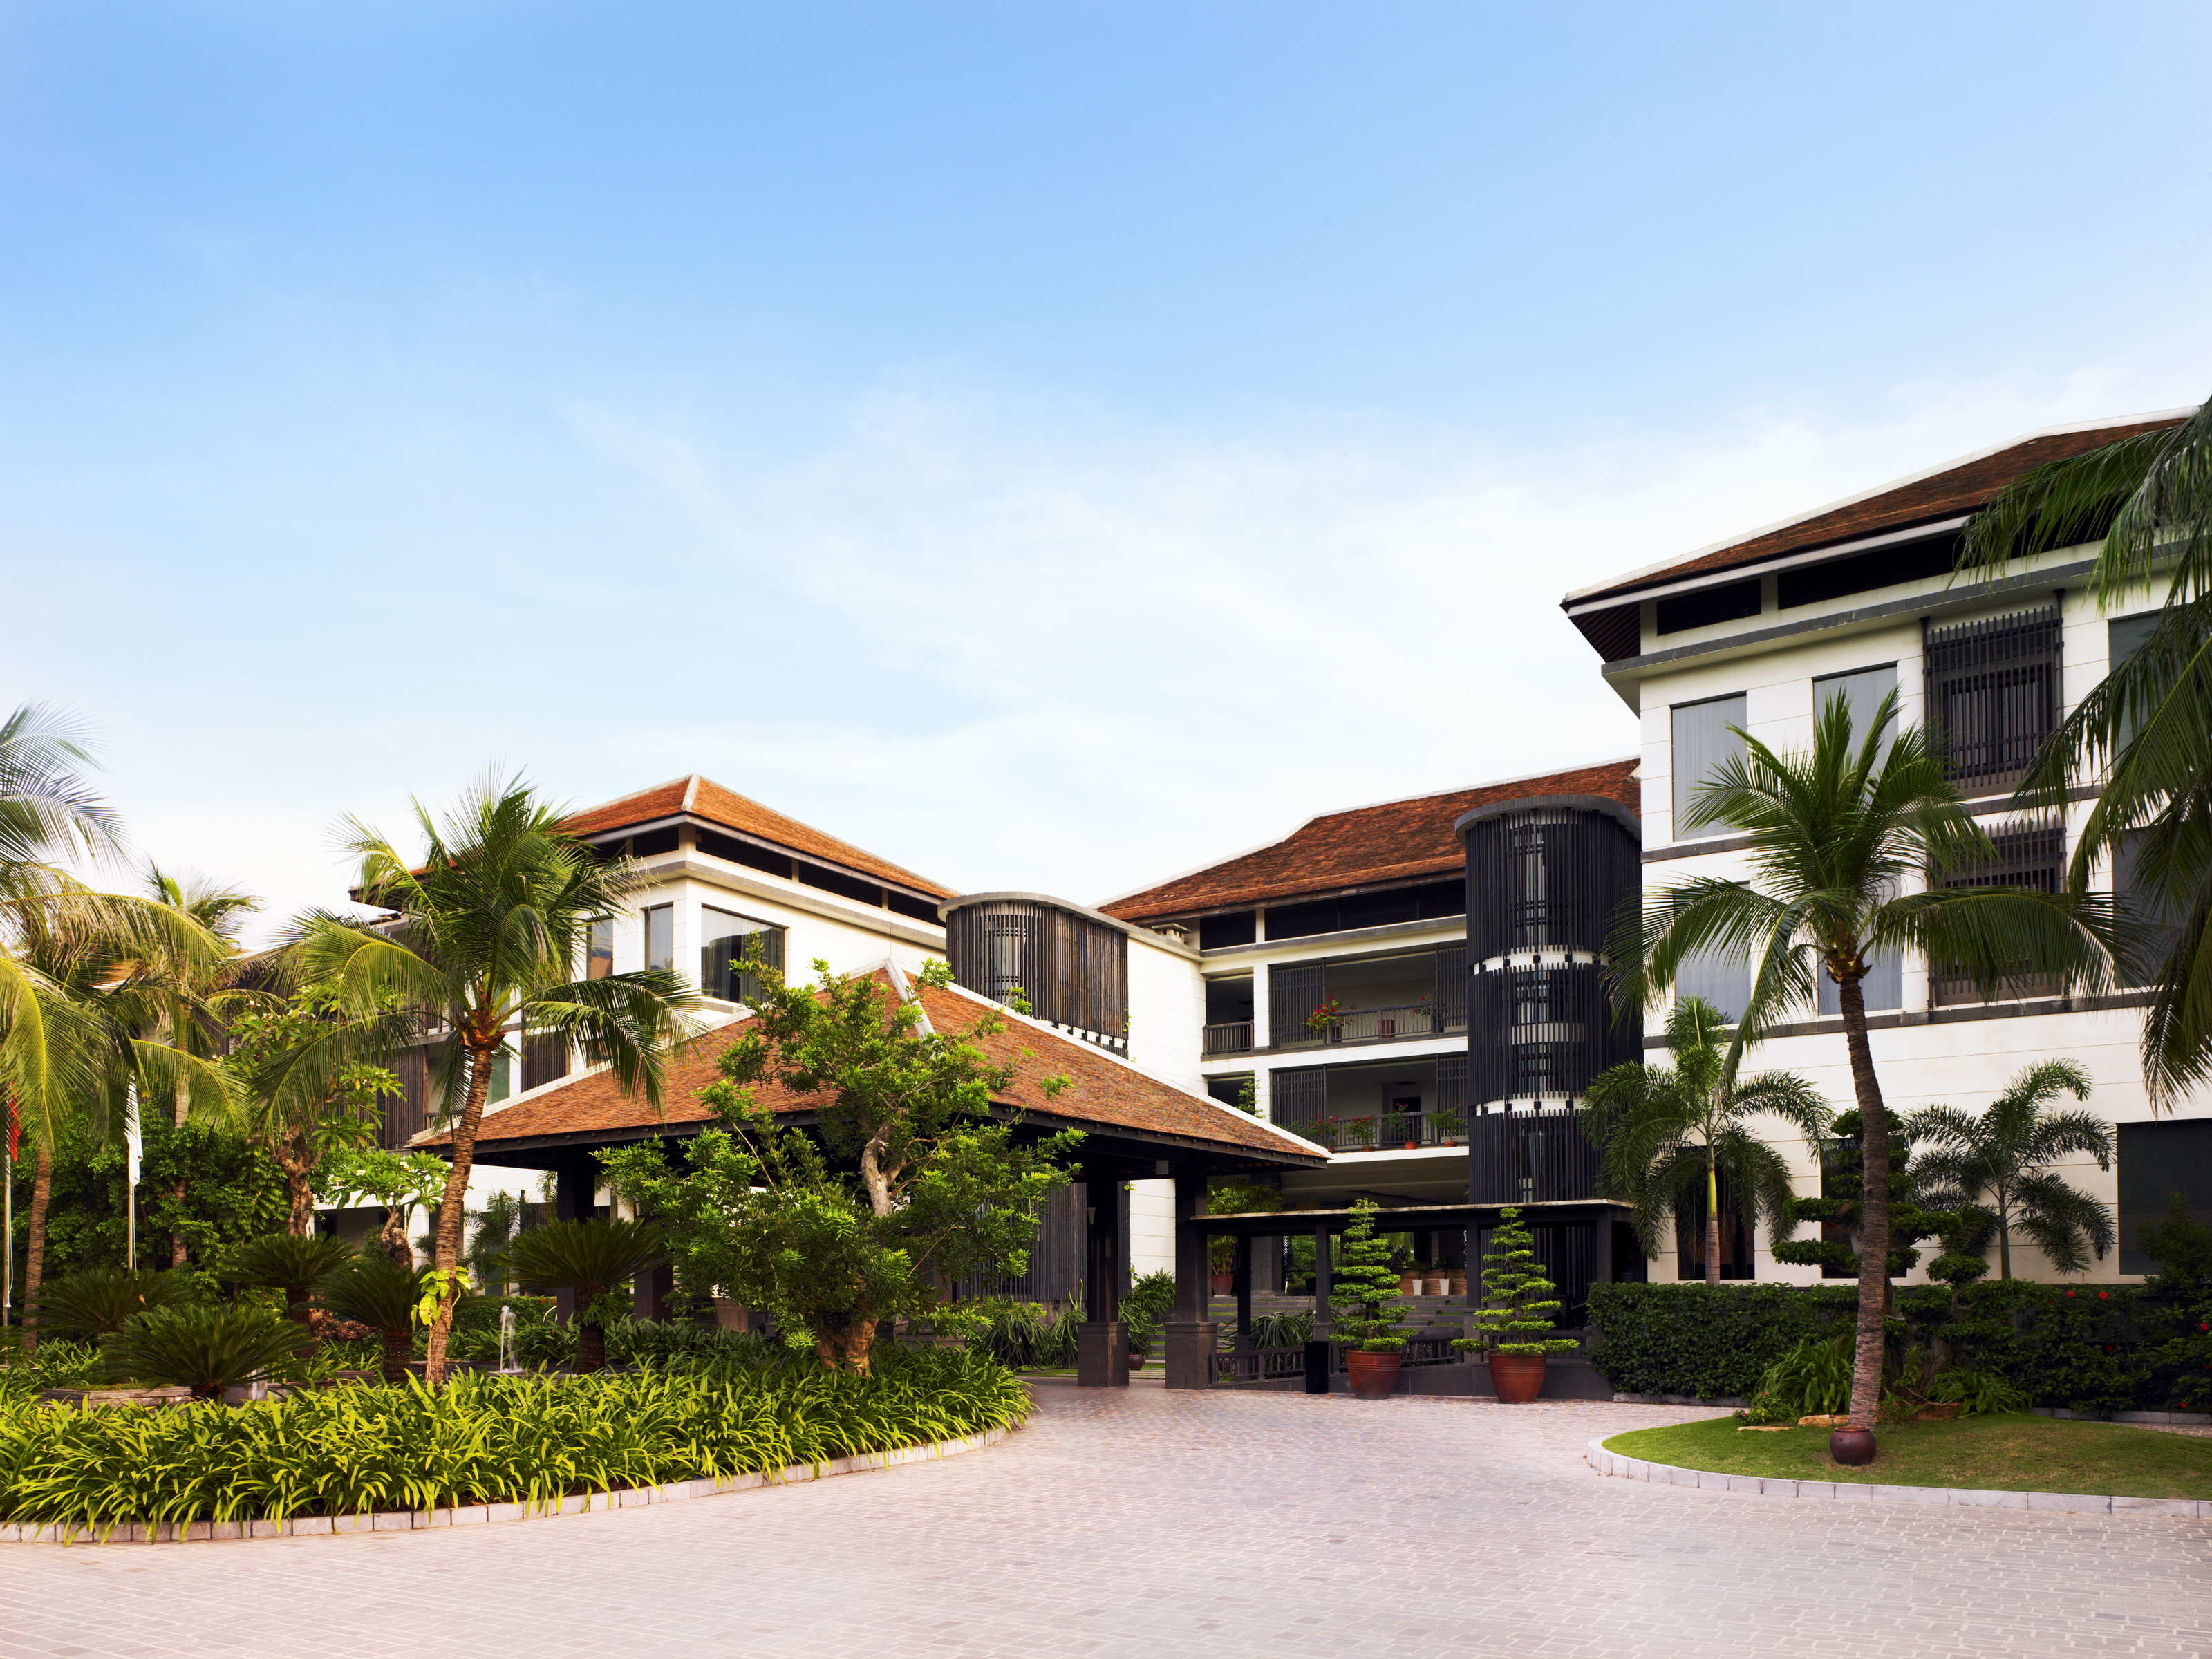 43699466-H1-Resort_Exterior